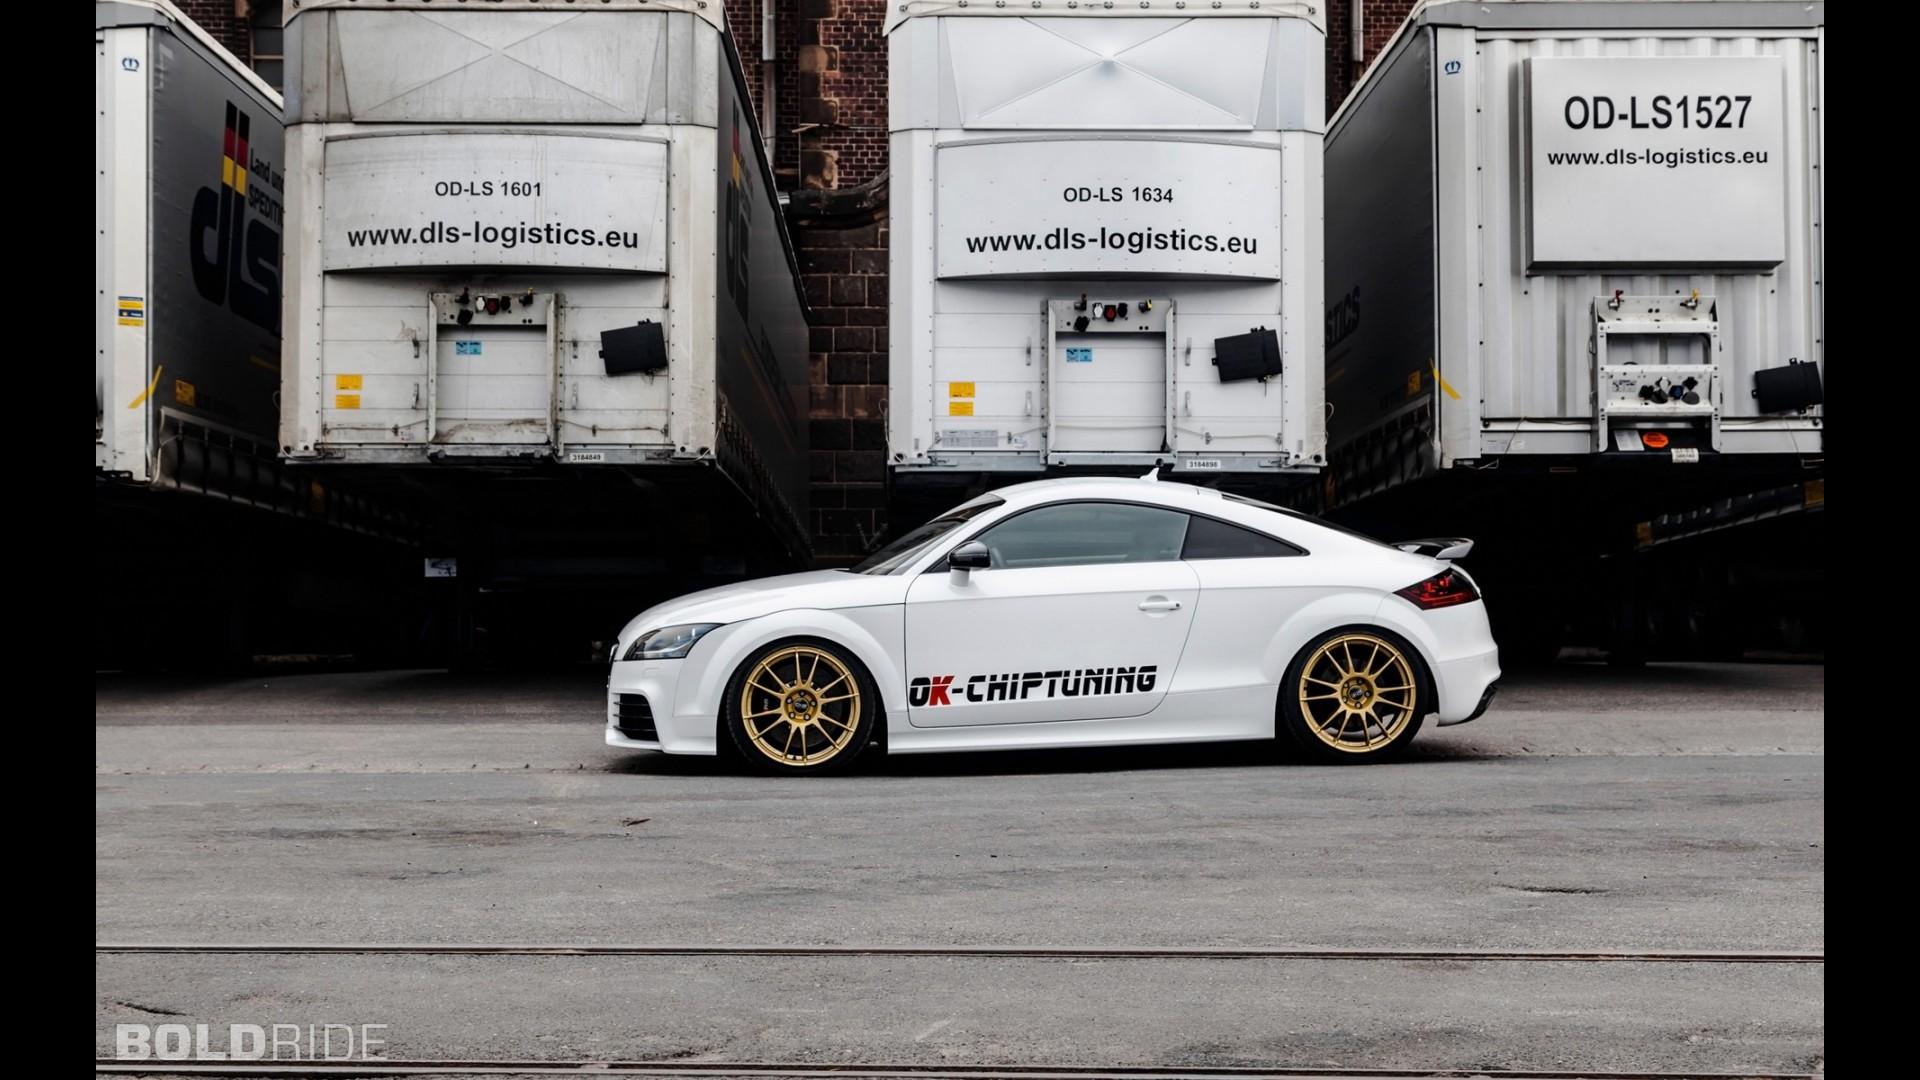 Купе Audi TT RS Plus от OK-Chiptuning